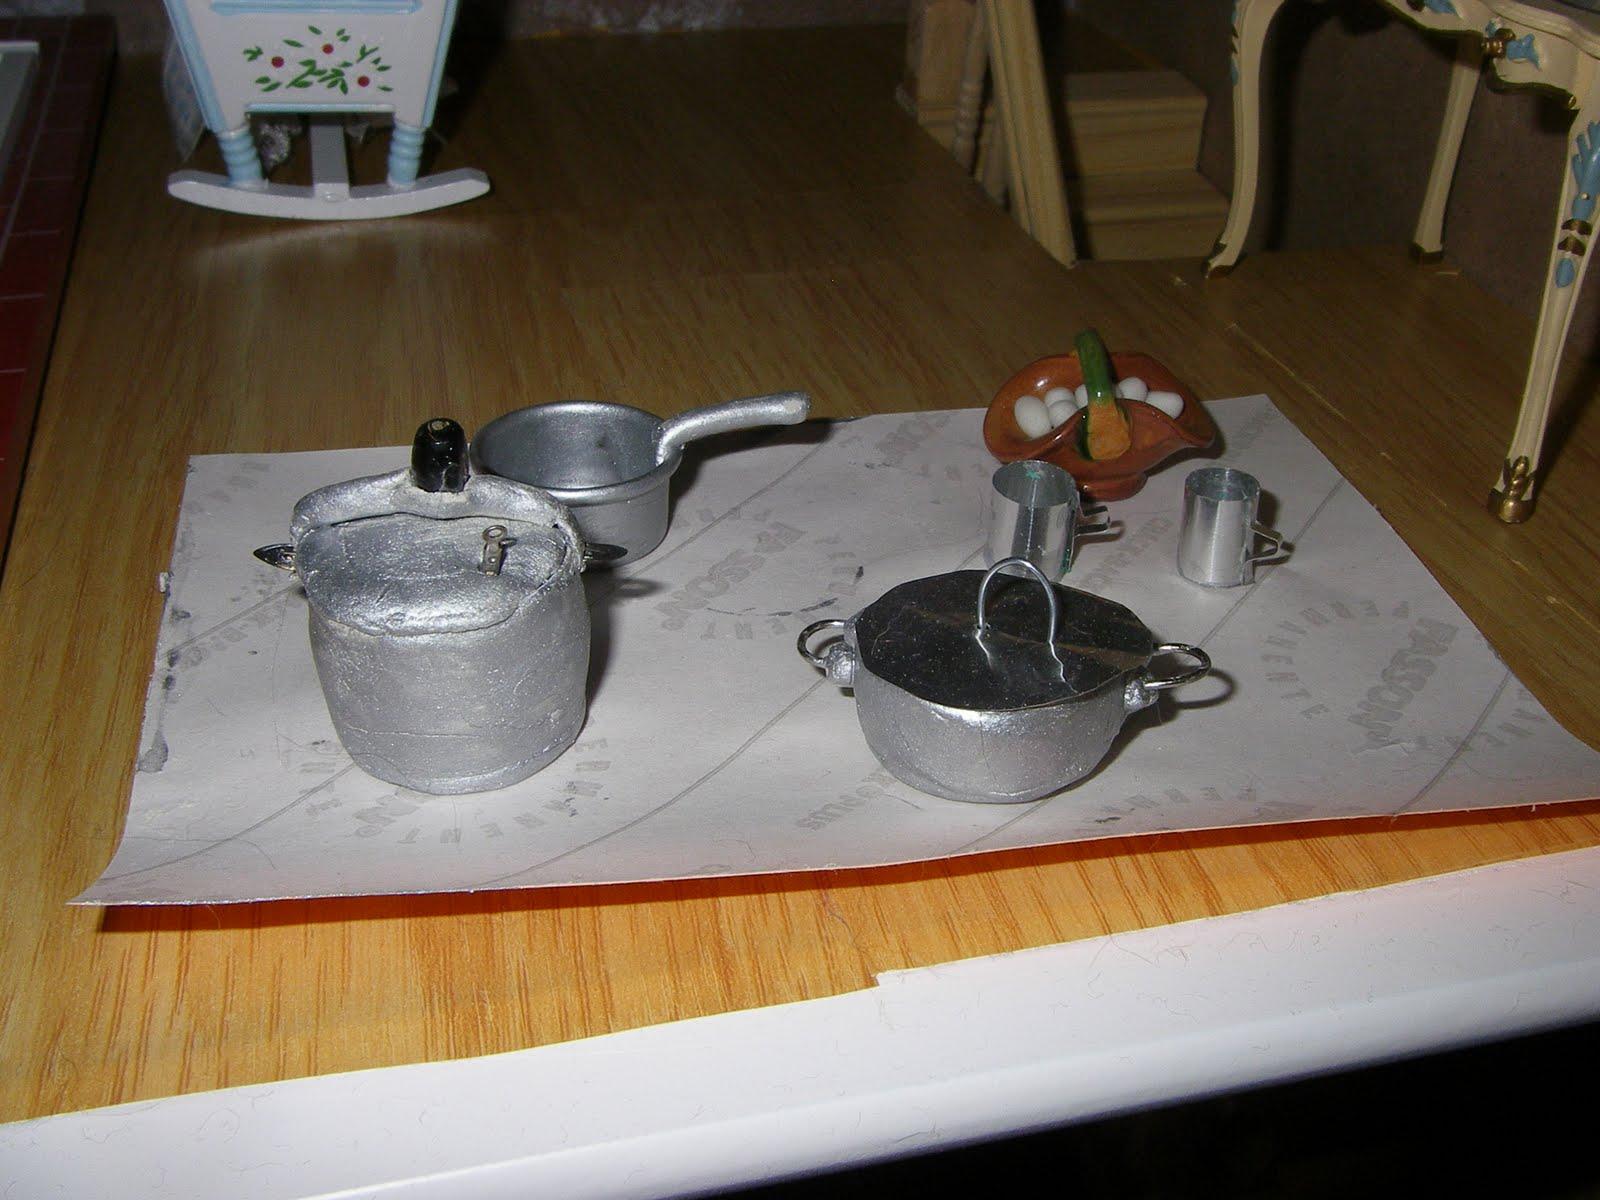 Cruce de caminos cacharros de cocina for Cacharros de cocina